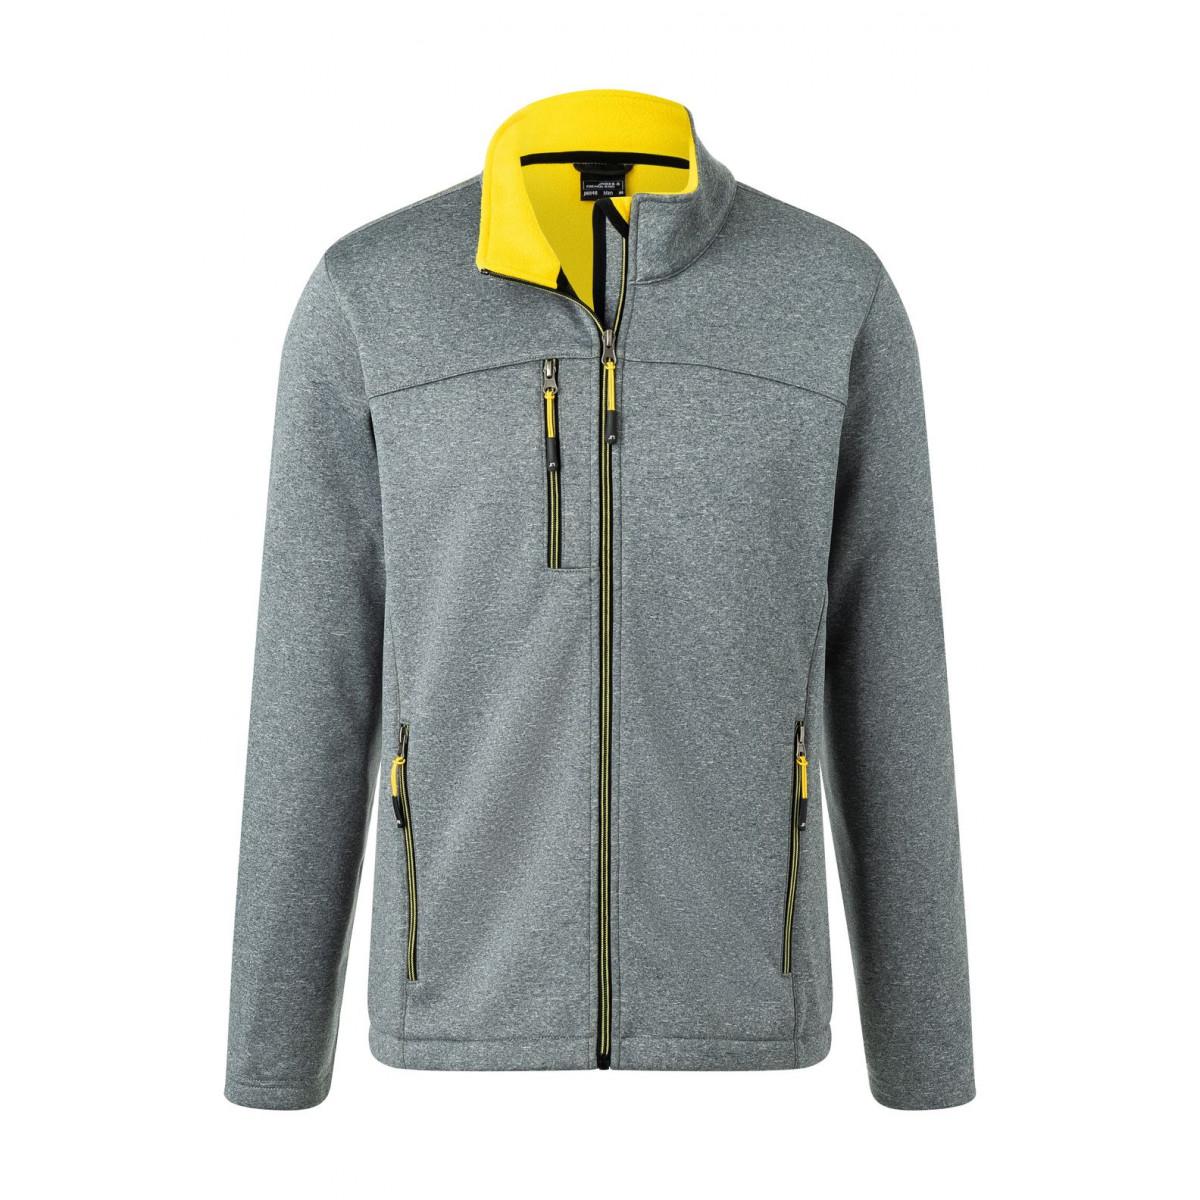 Куртка мужская JN1148 Mens Softshell Jacket - Темно-серый меланж/Желтый